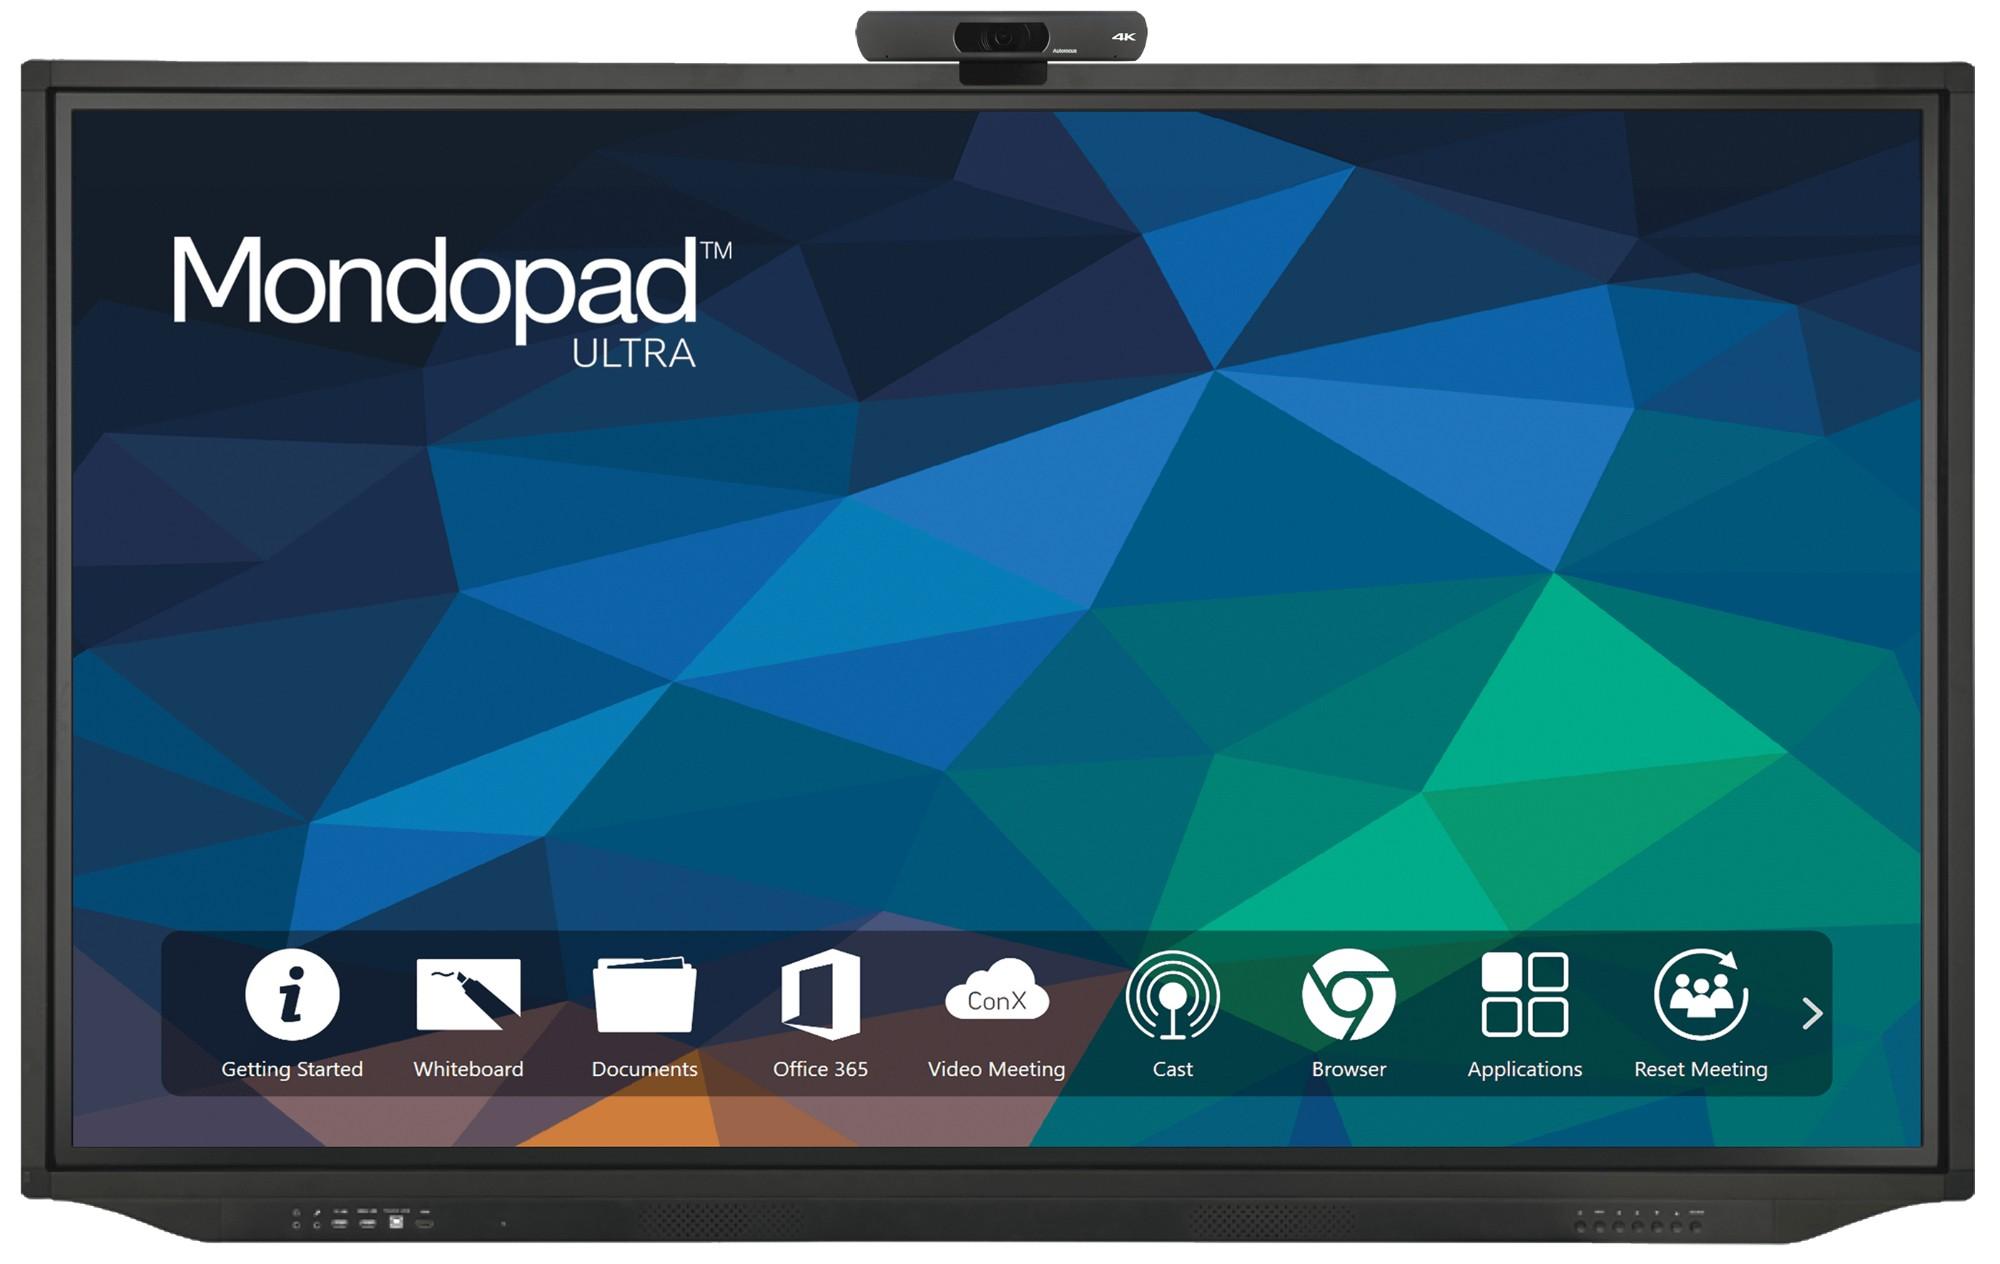 Mondopad Ultra 75in - 4K UHD Touch - i7 7500U - 8GB Ram - 256GB SSD - Win10 Pro / Android (v5.0)